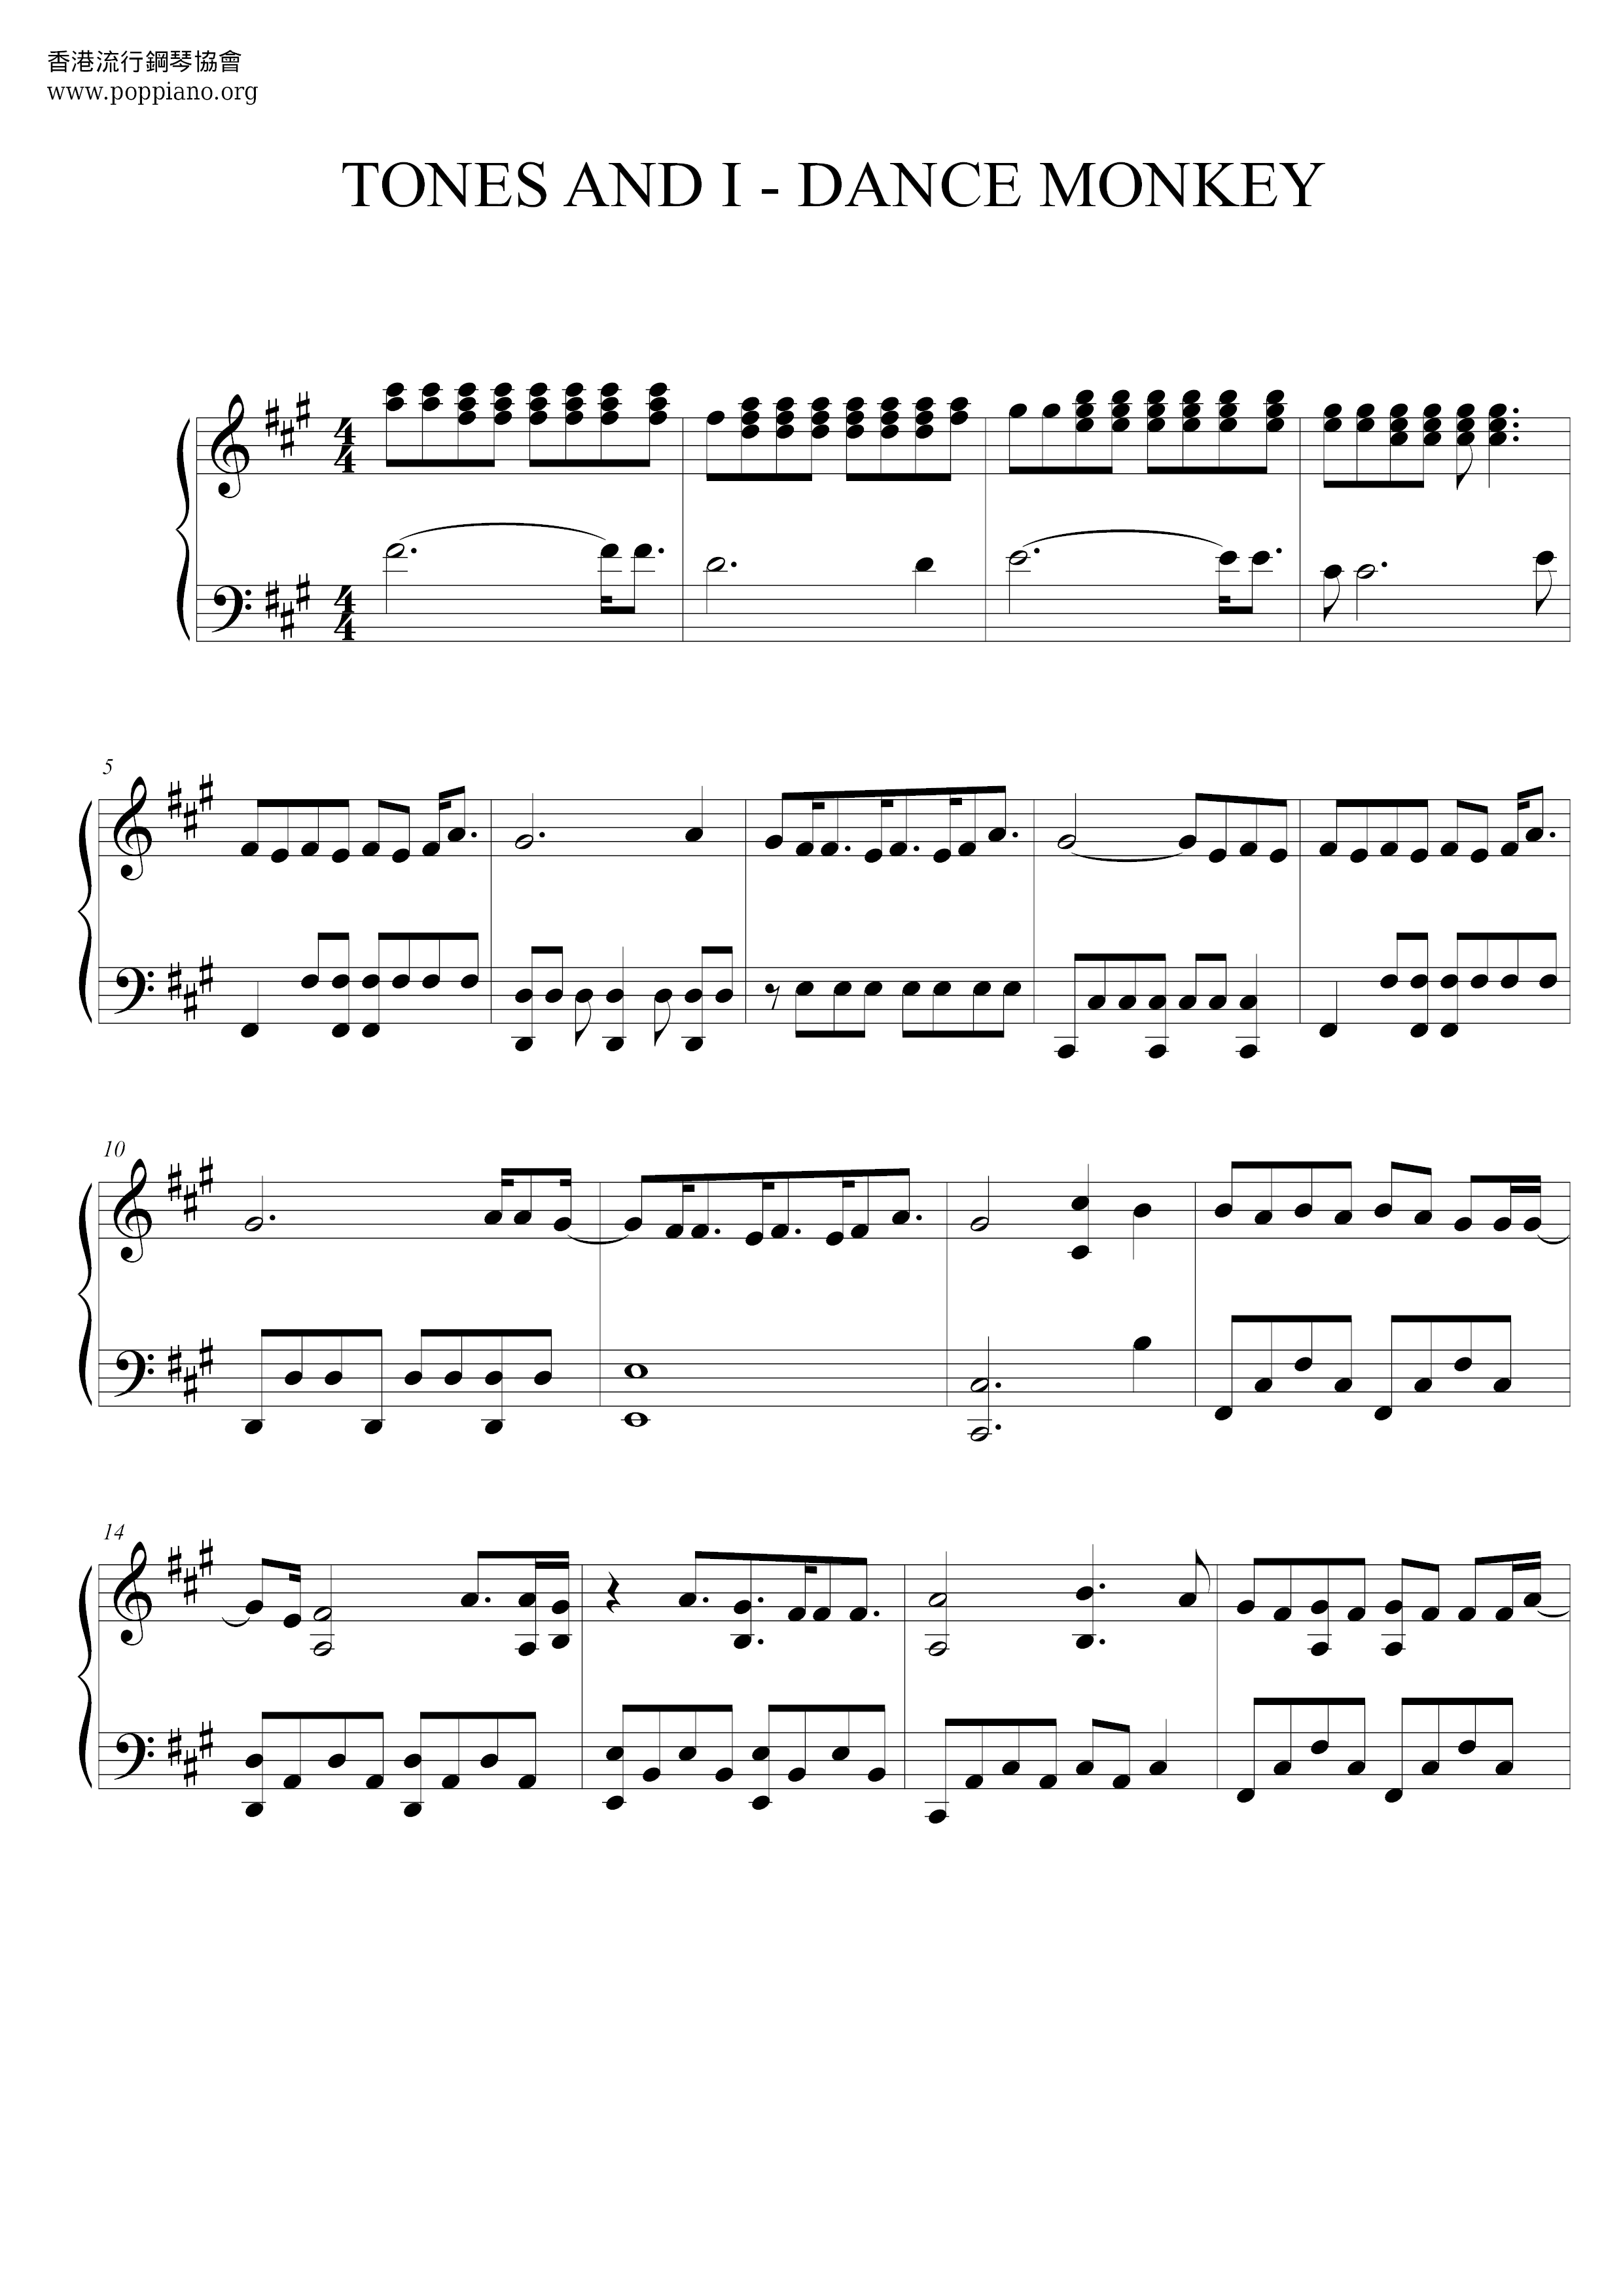 Tones And I Dance Monkey Sheet Music Pdf Free Score Download